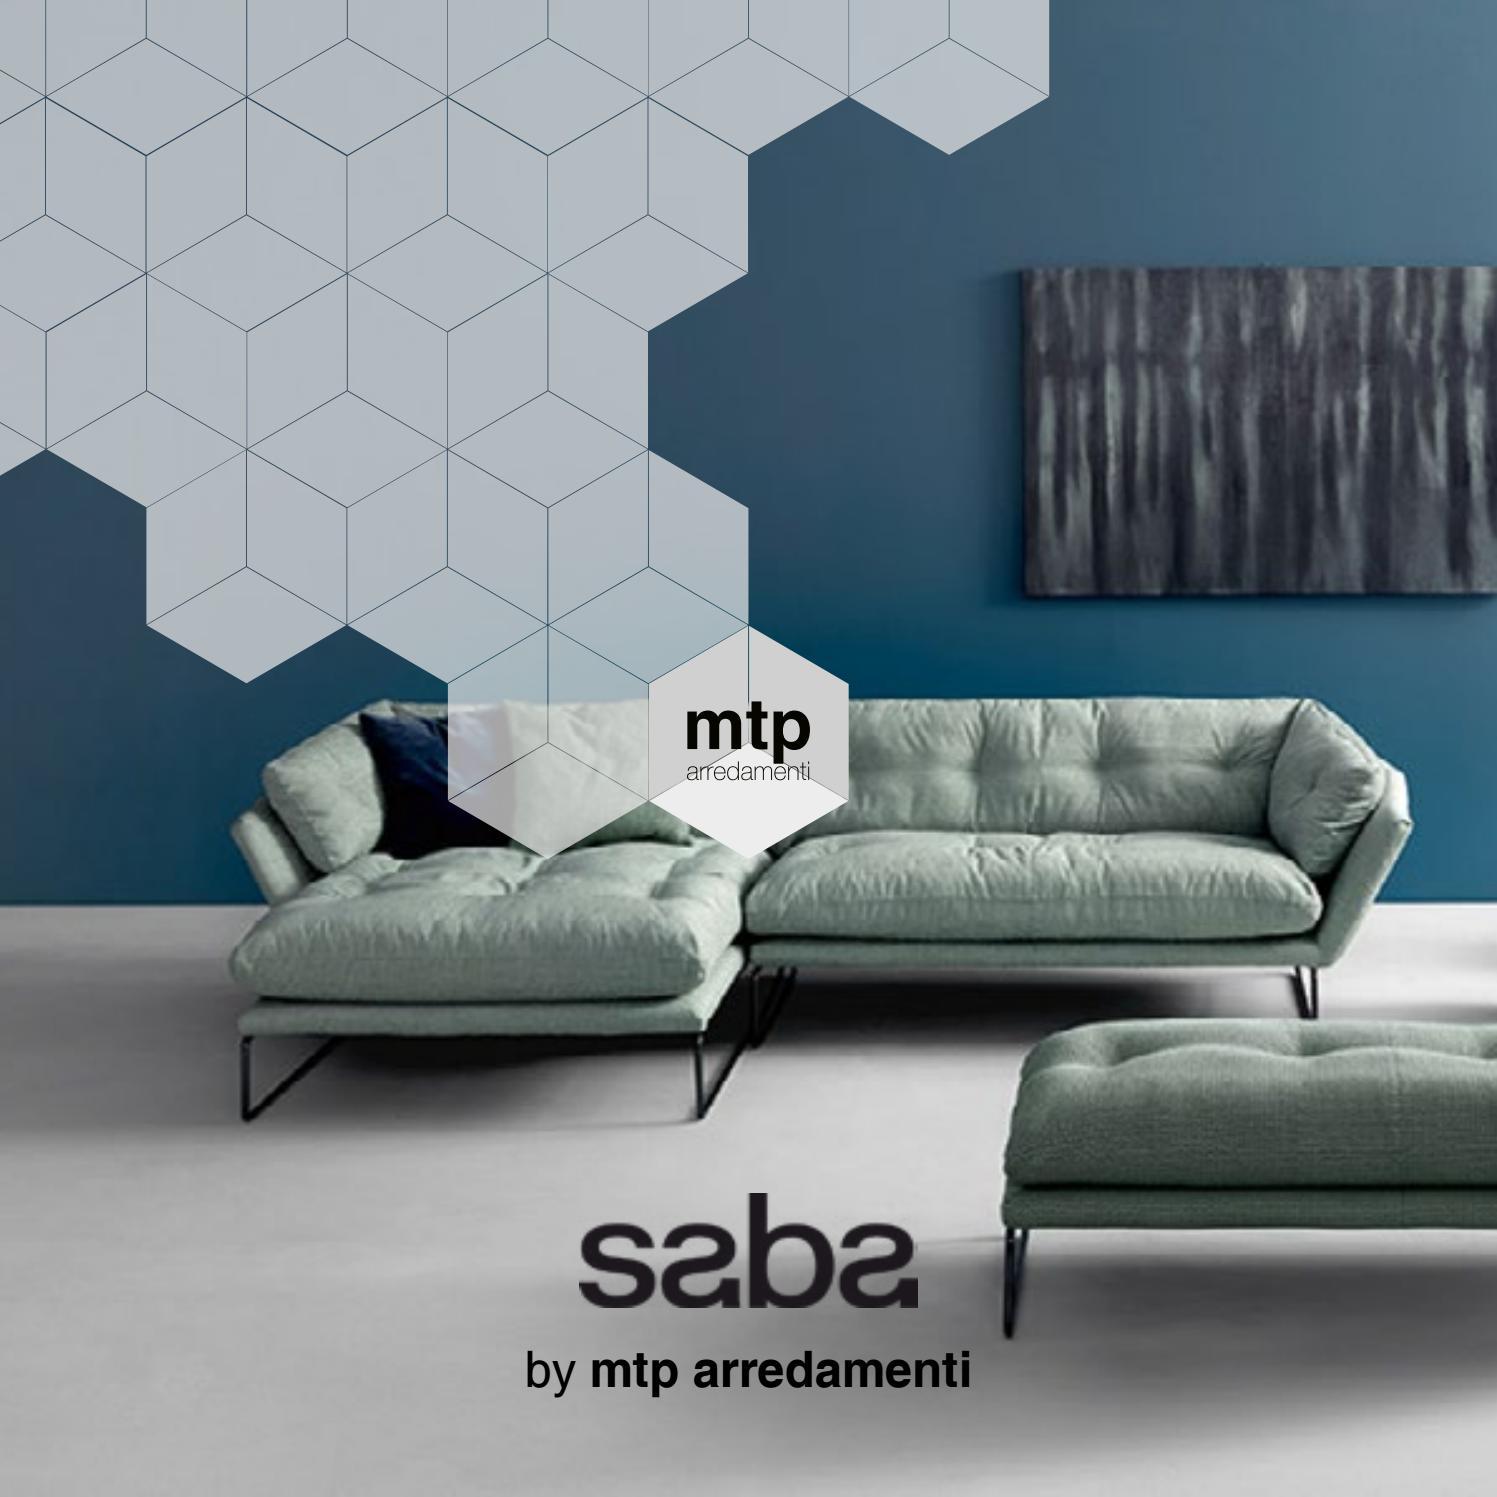 Saba by mtp arredamenti by plano storie issuu for Selezione arredamenti